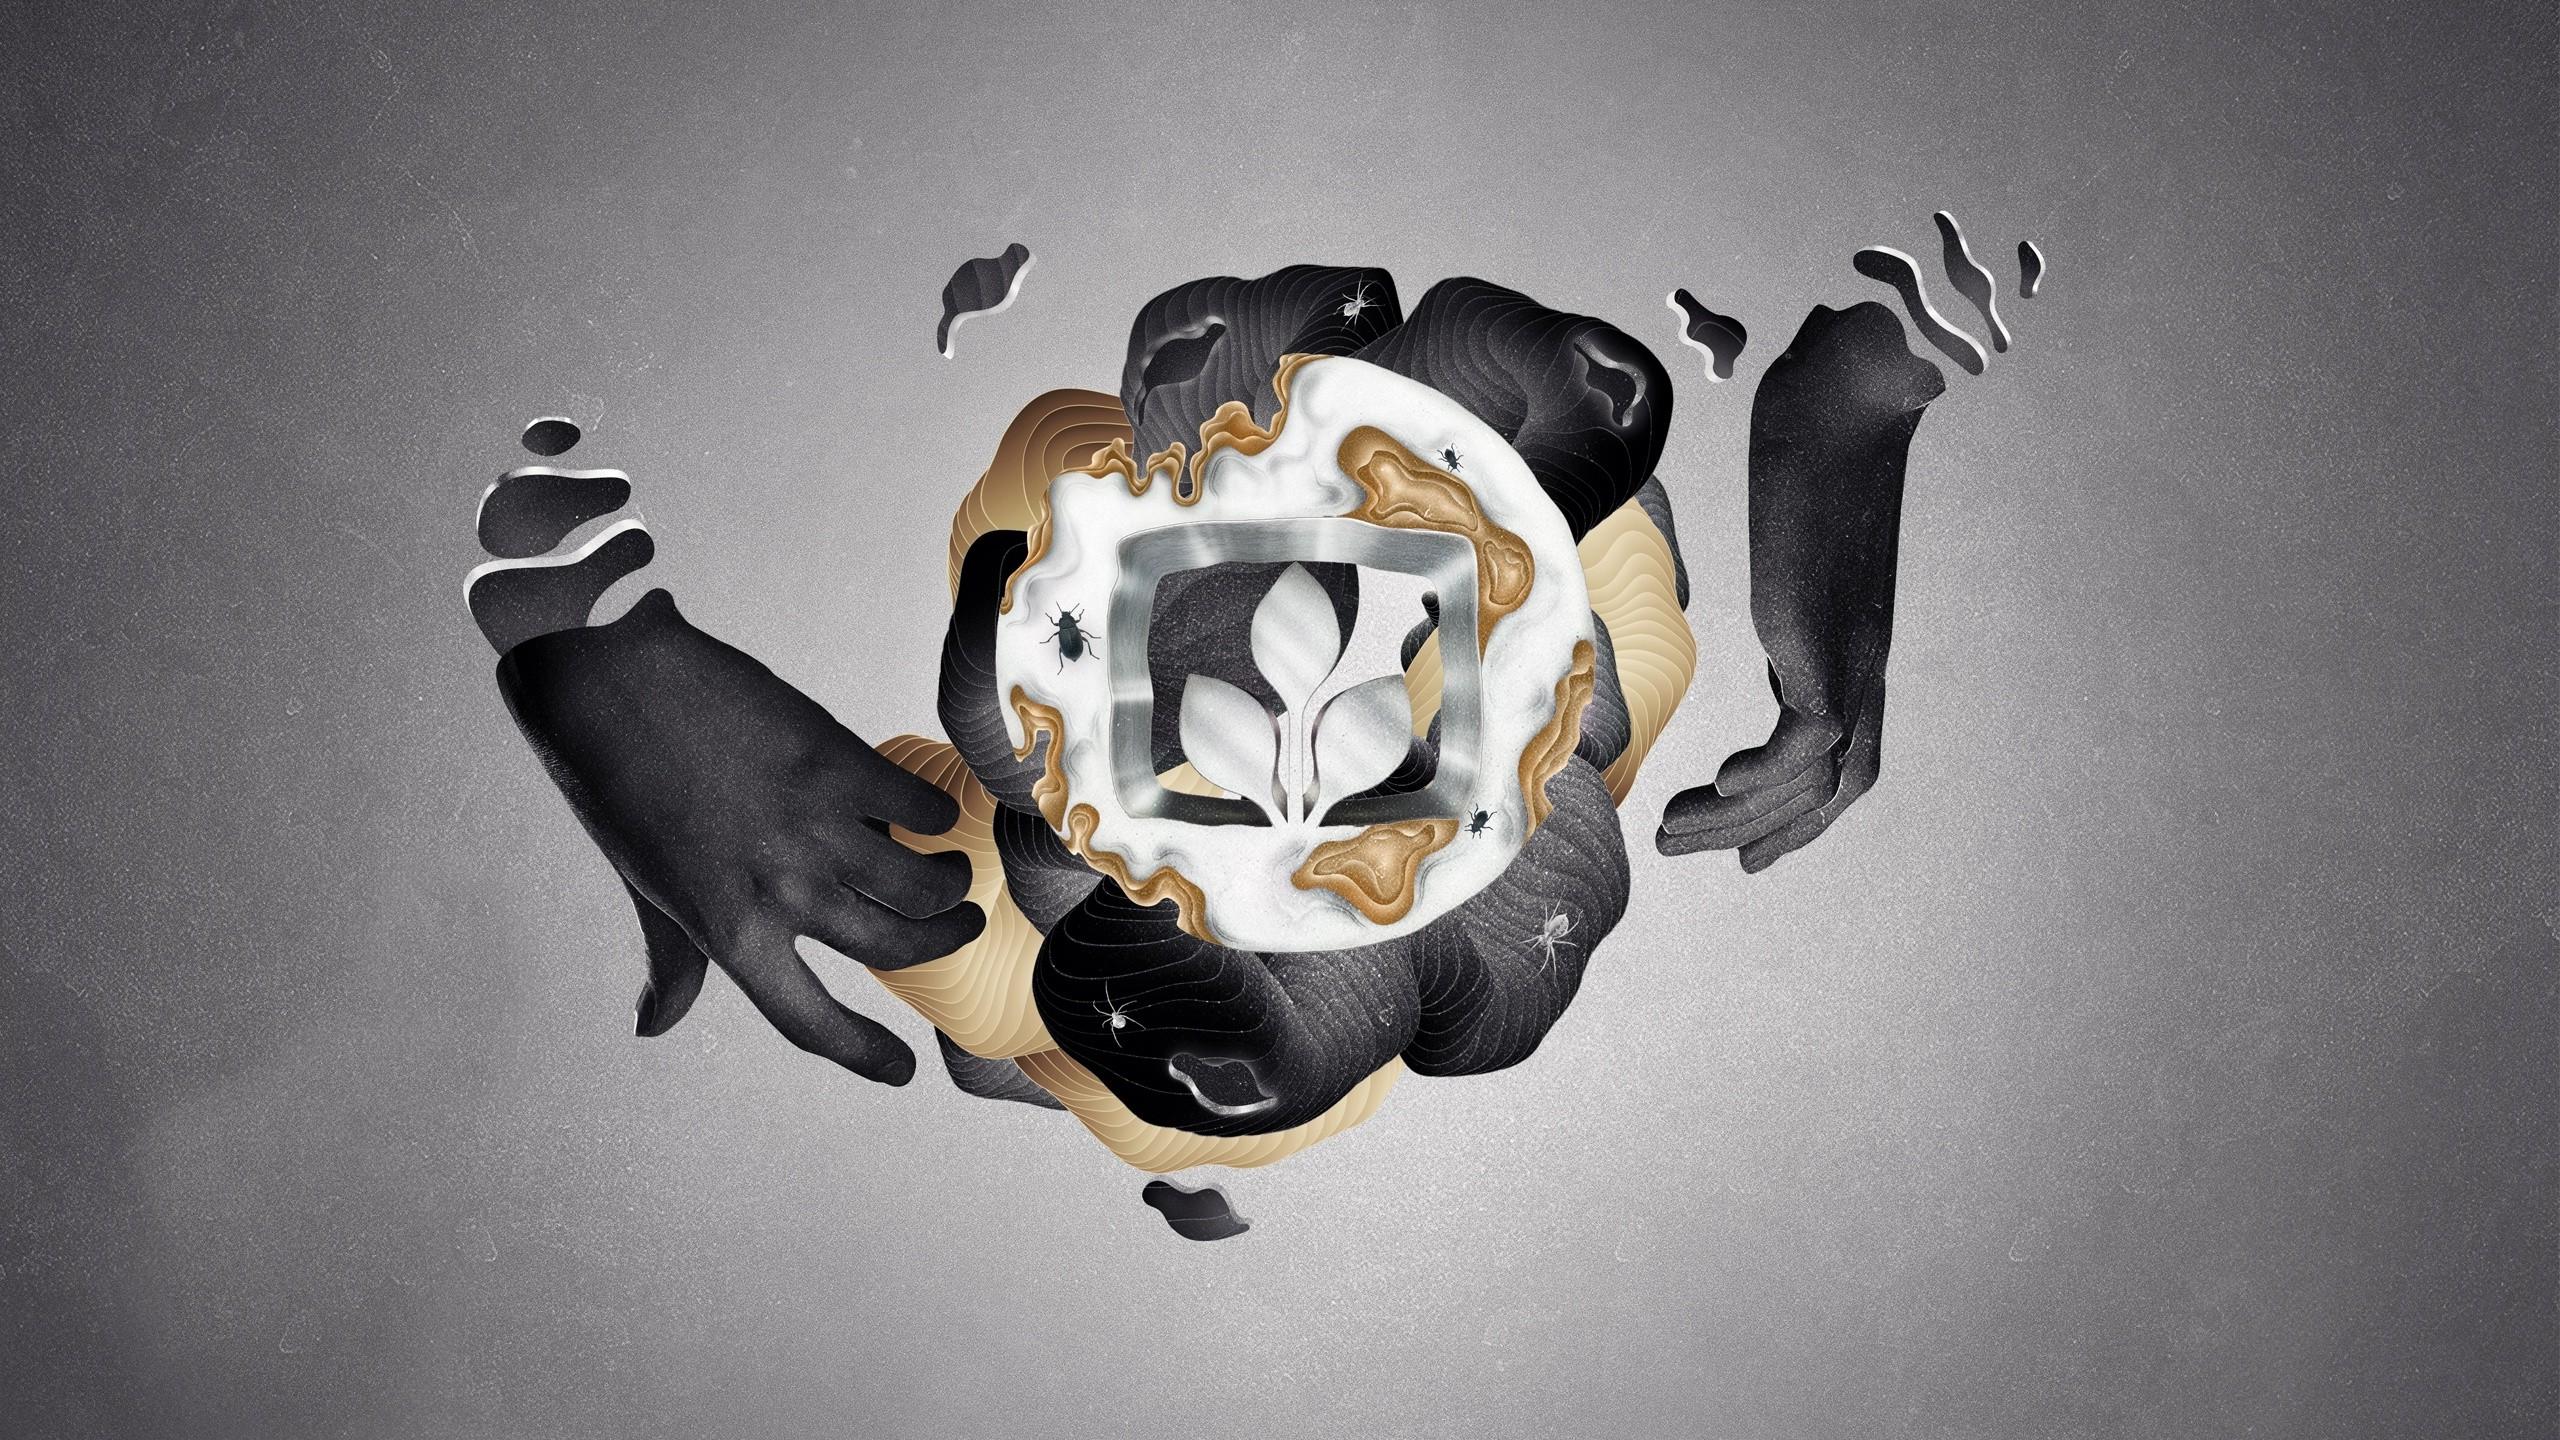 White Black Illustration Digital Art Photography Logo Blue Desktopography Light Hand Darkness Costume 2560x1440 Px Computer